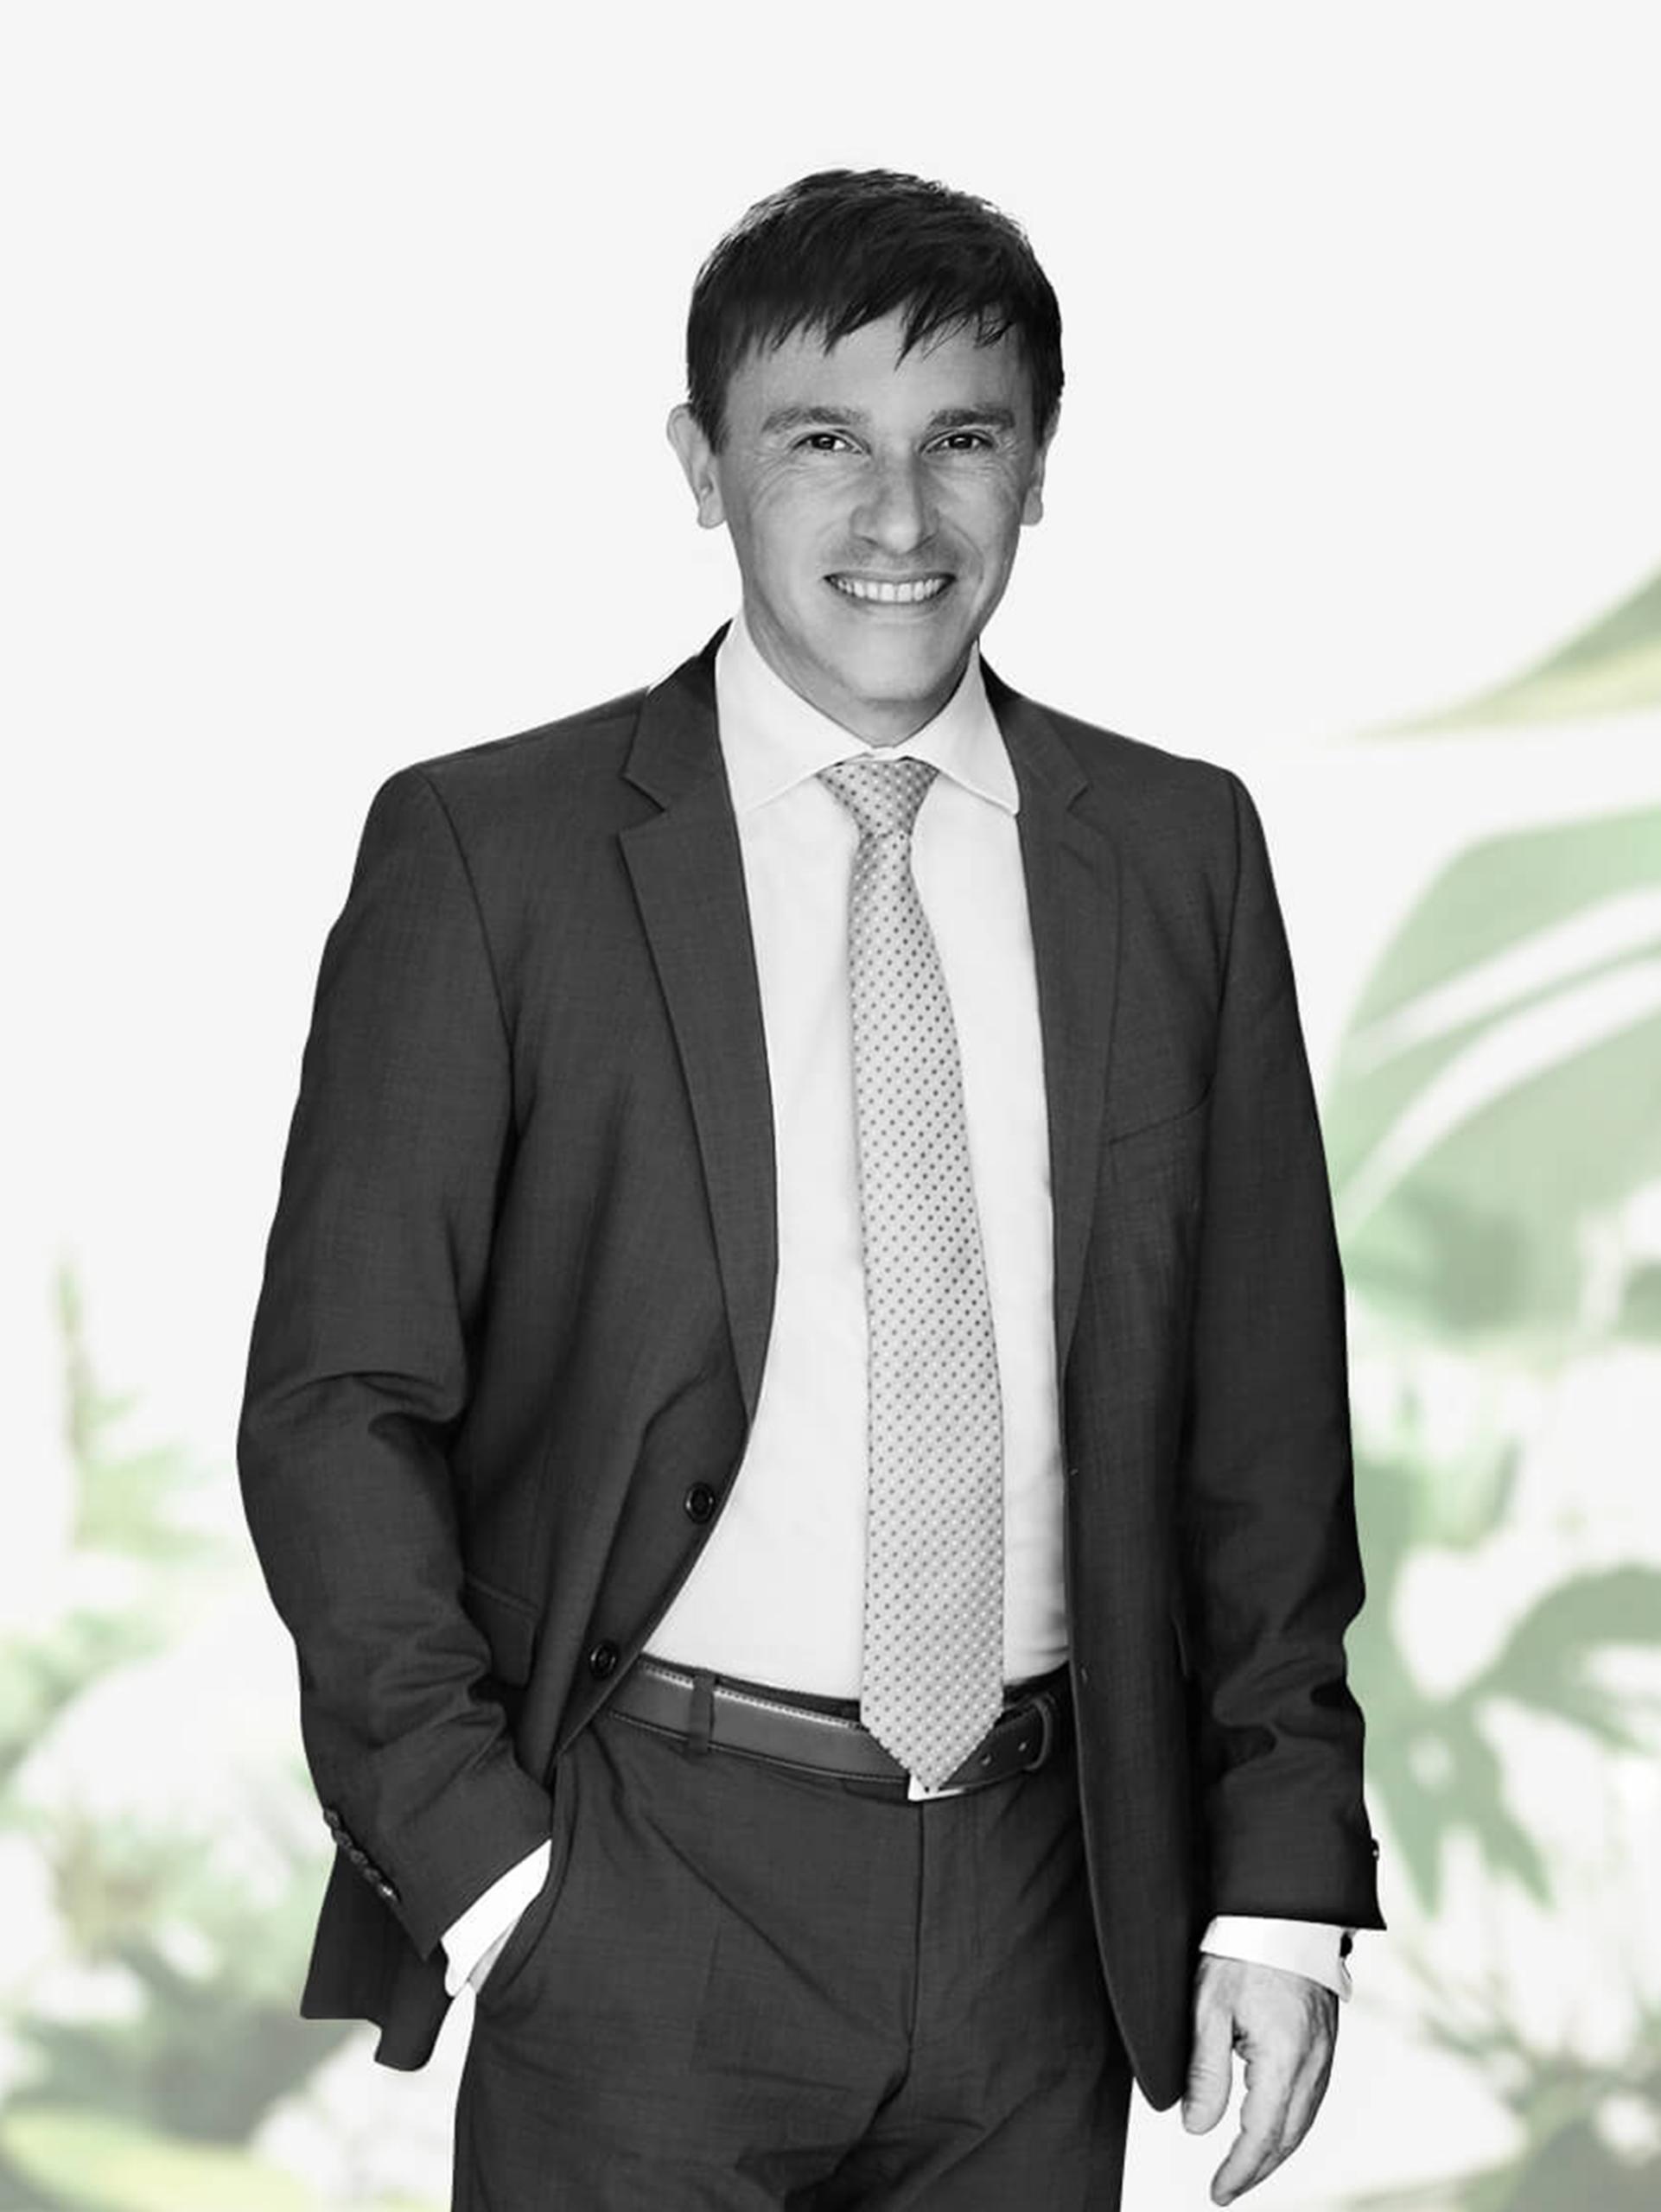 Jörn Krause - Geschäftsführer bei Krause&Schopp